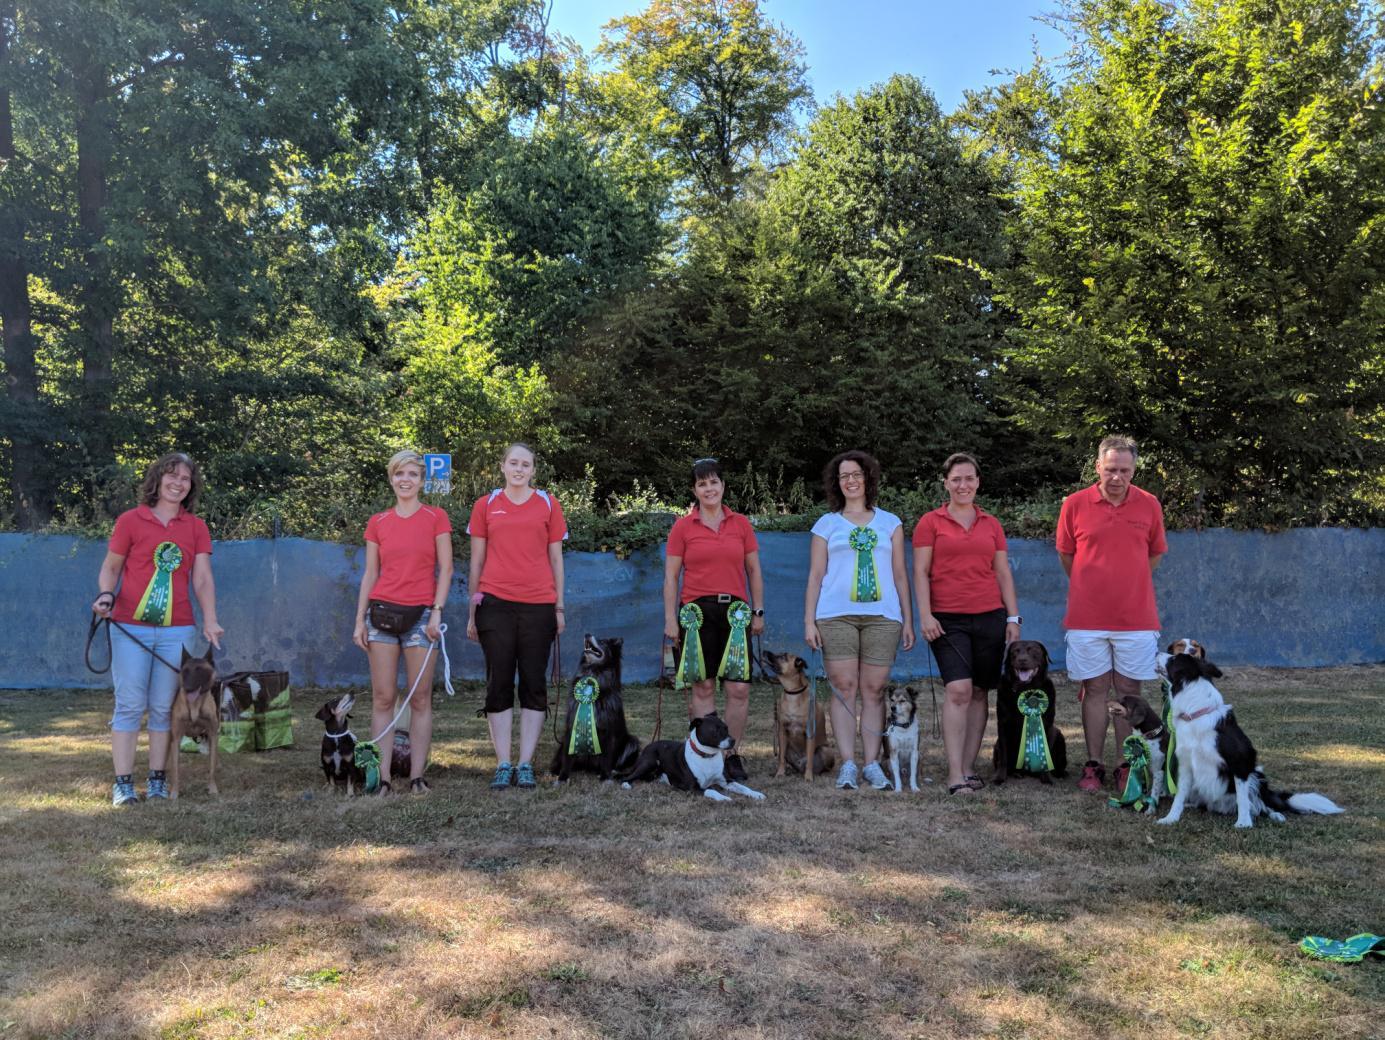 Rally Obedience Landesmeisterschaft 2018